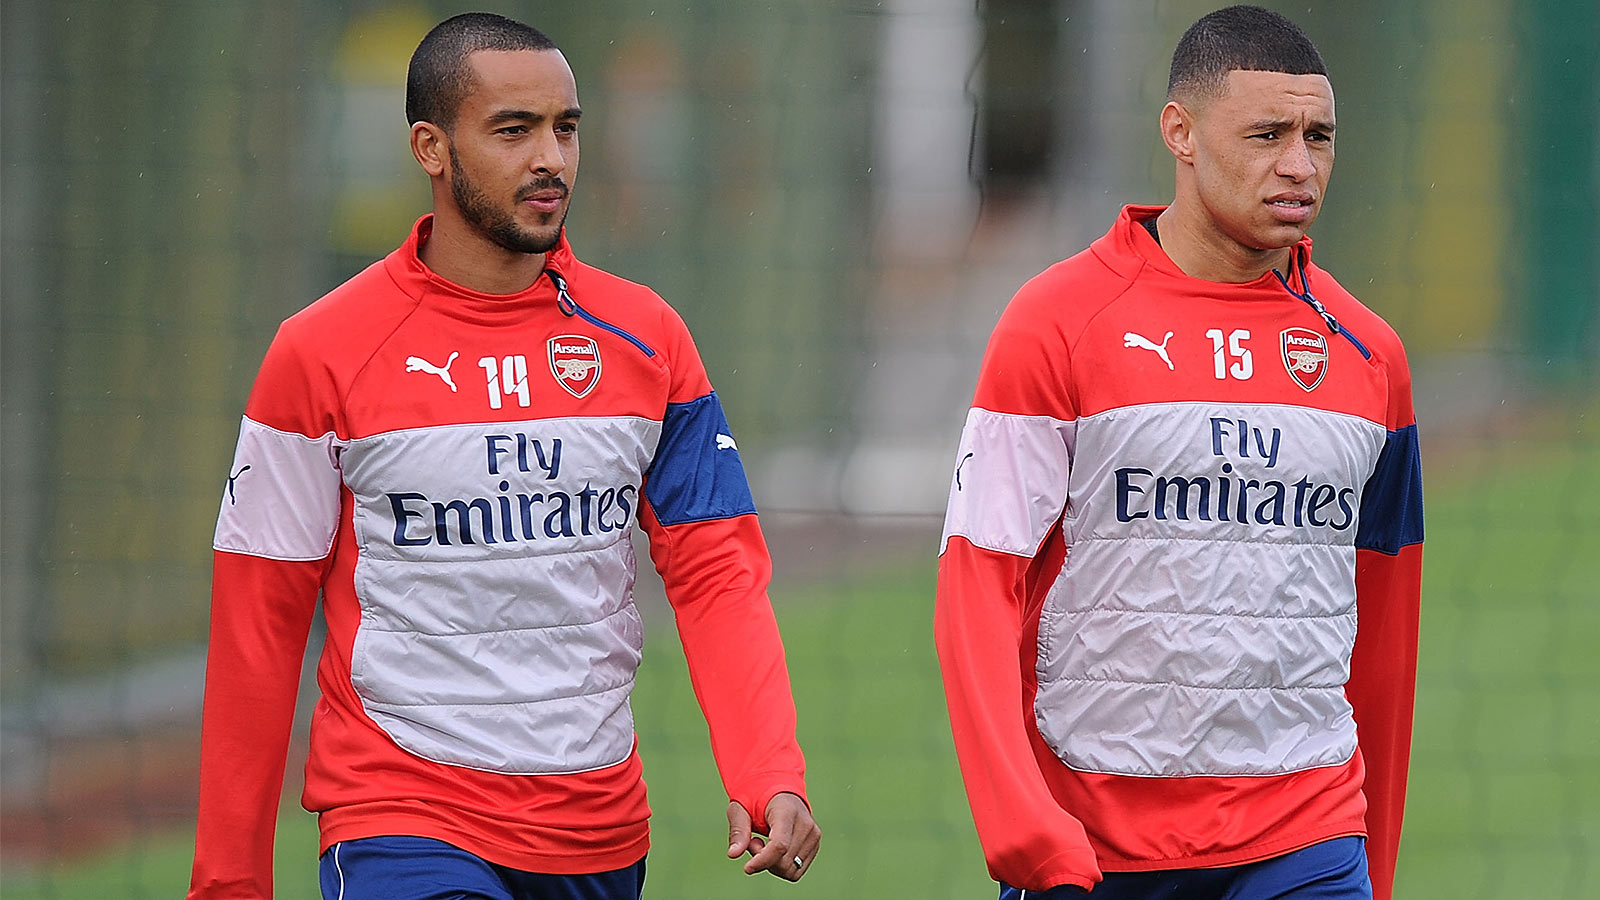 Walcott, Oxlade-Chamberlain to miss Arsenal's next 3 games